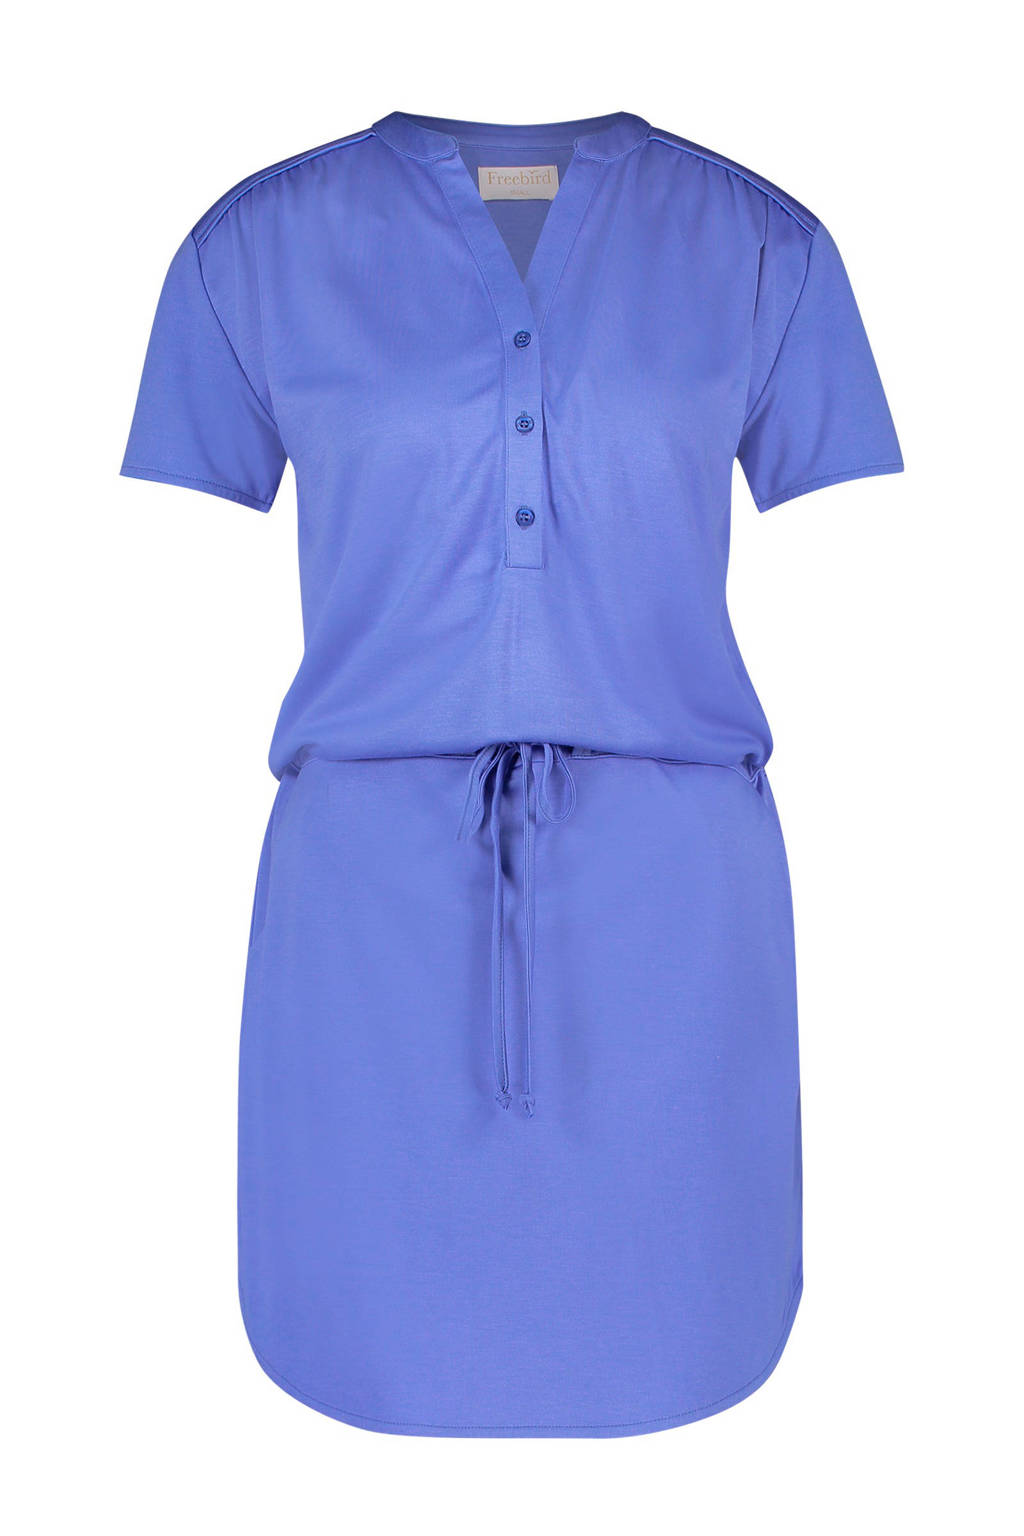 Freebird jurk met koord, Blauw